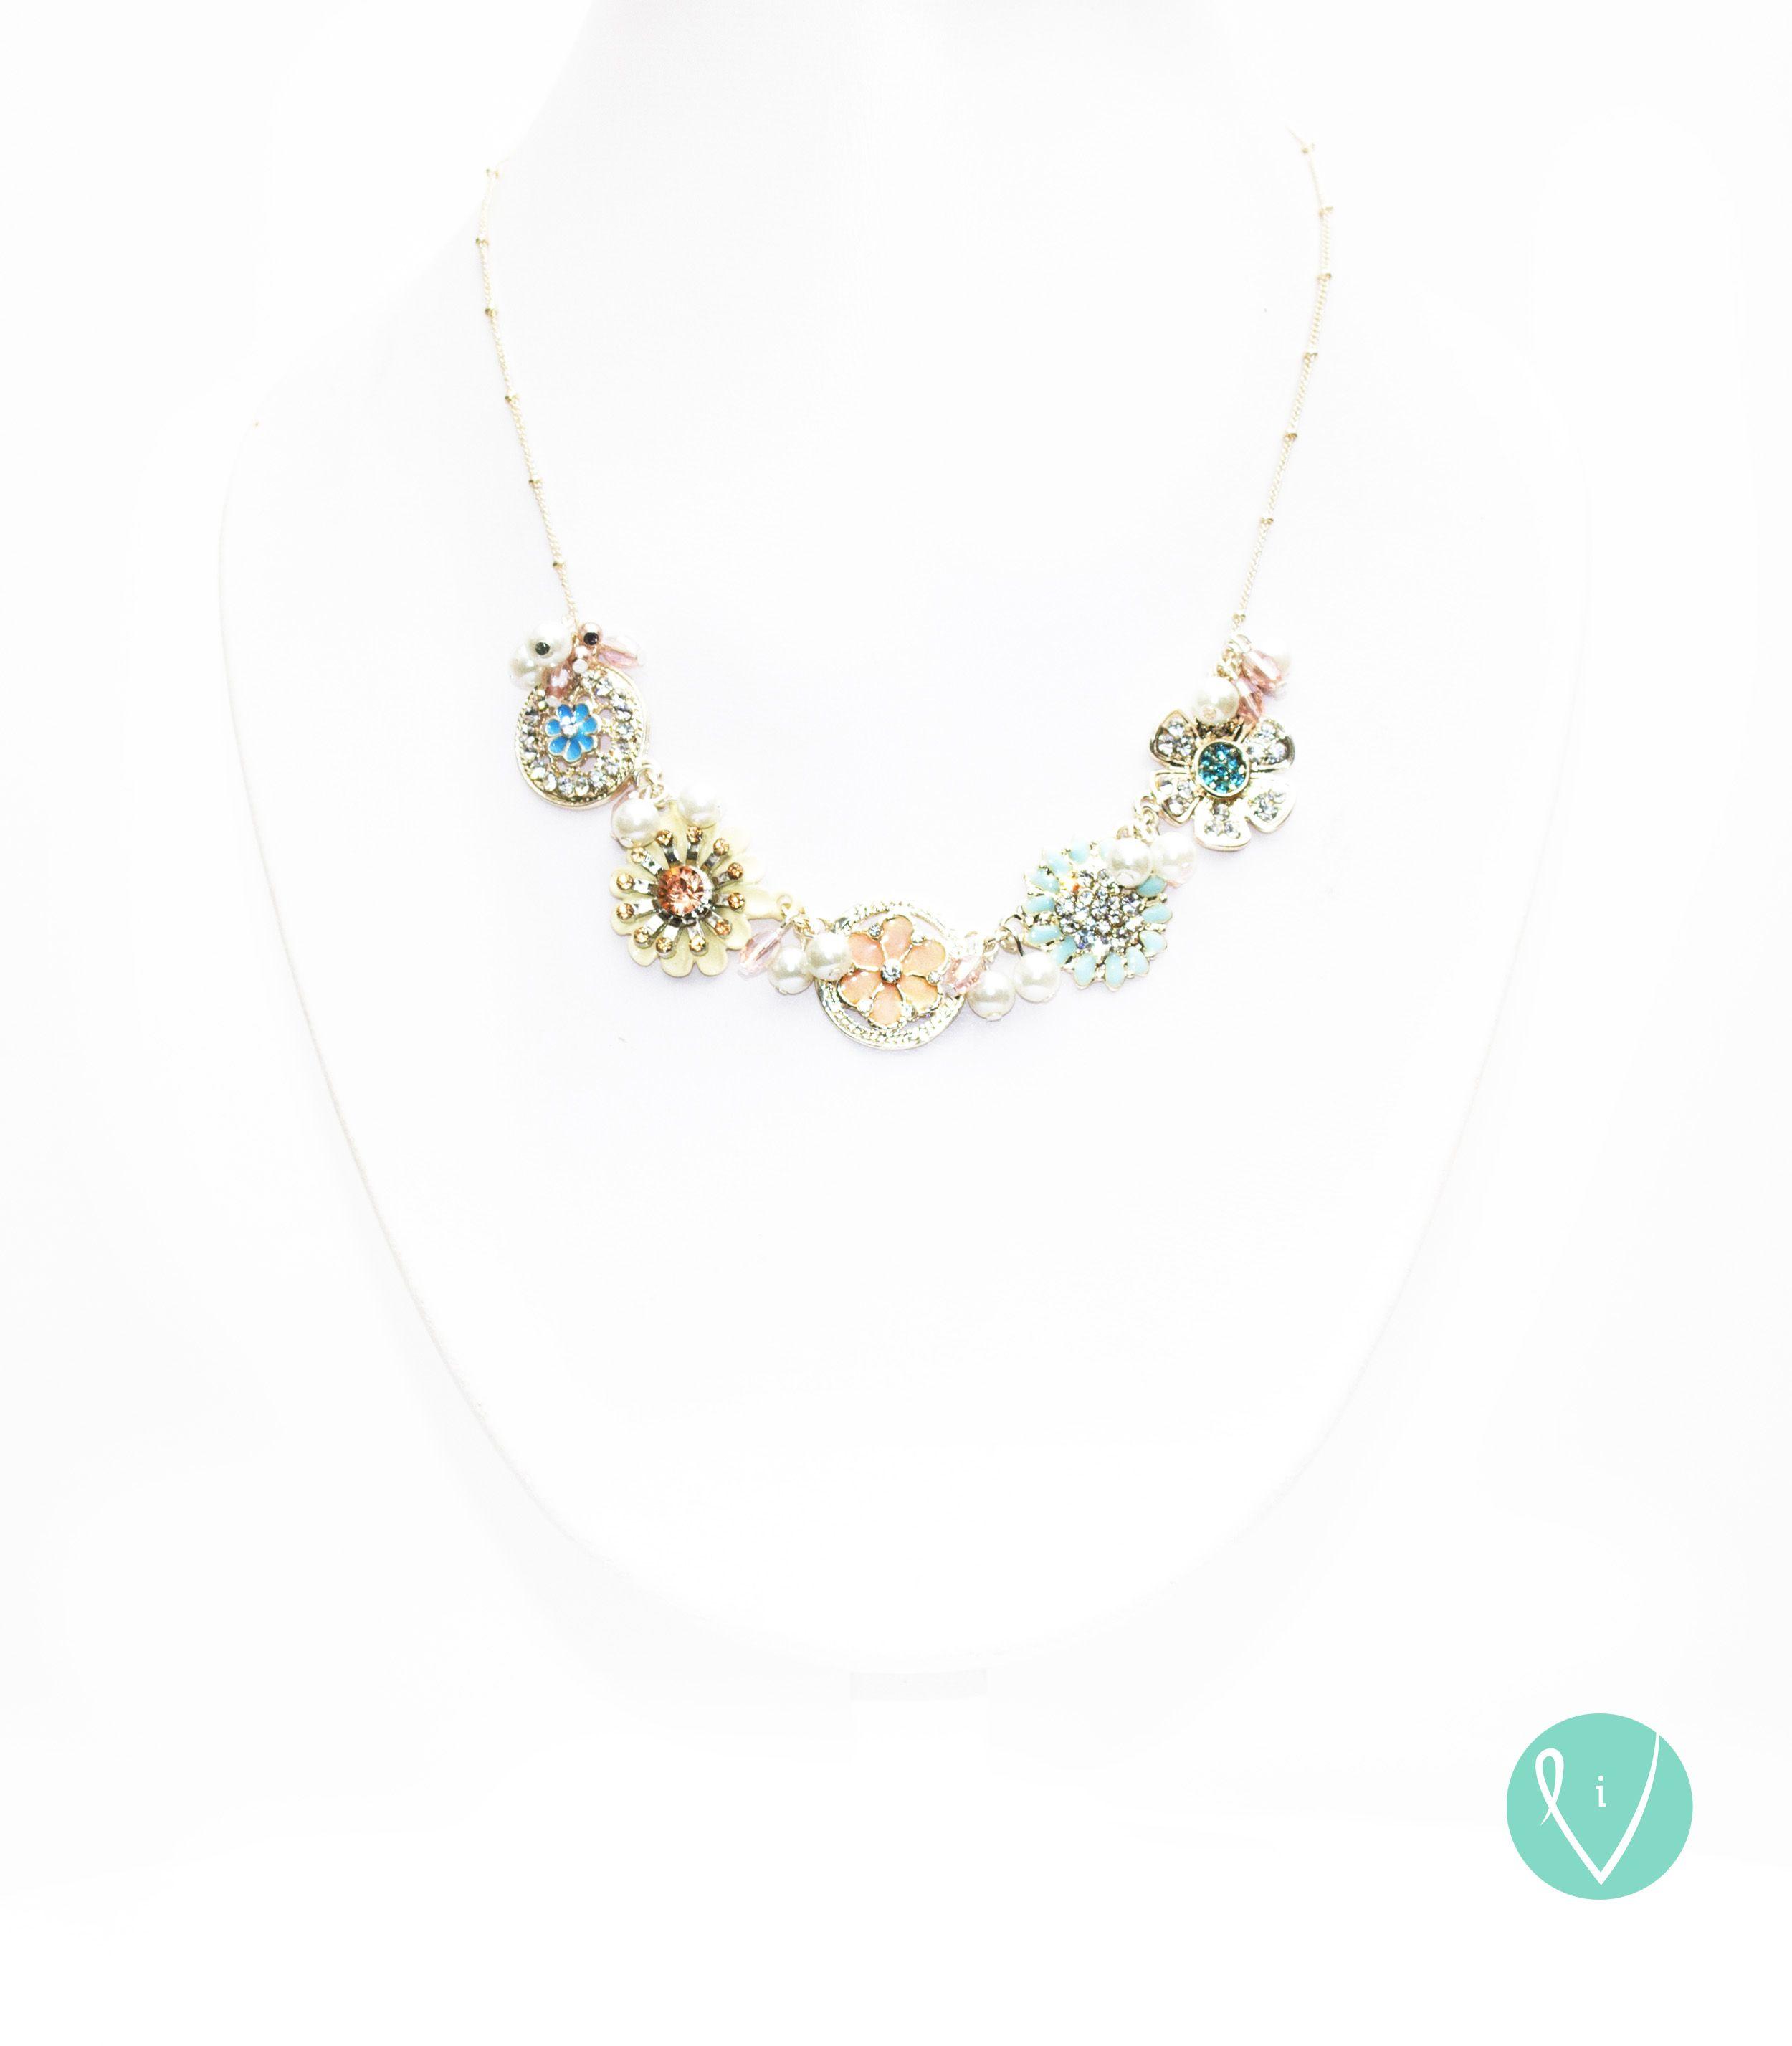 Find our jewelry at www.vidali.com.mx or facebook.com/vidalihandmade ¡WE SHIP WORLDWIDE! English/Spanish